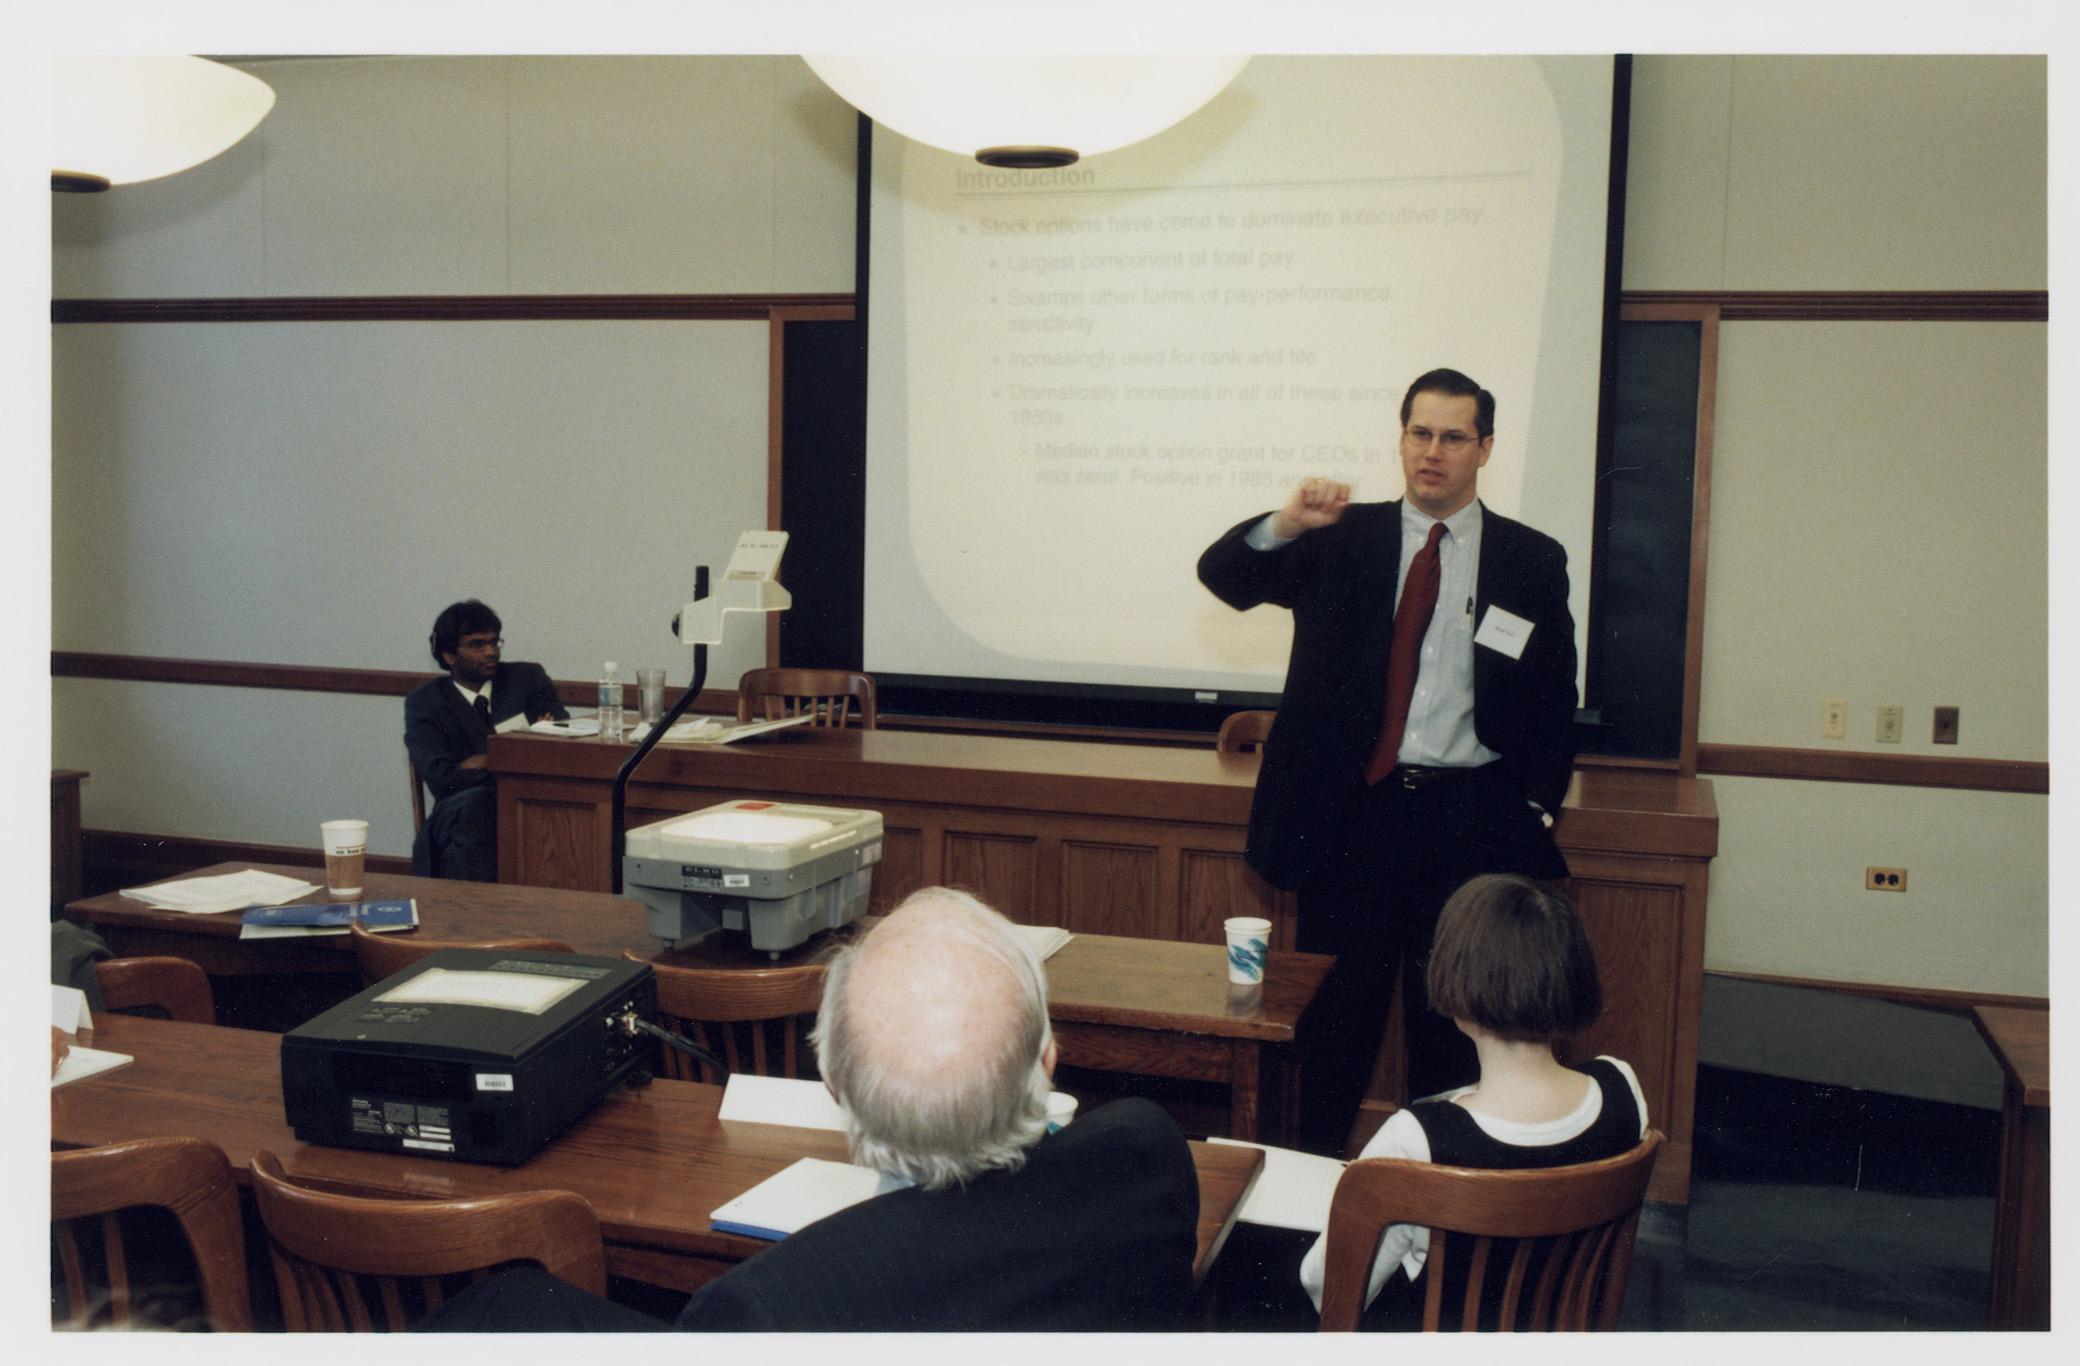 MIT Econ. Prof. Sendhil Mullainathan and Harvard Business Prof. Brian Hall